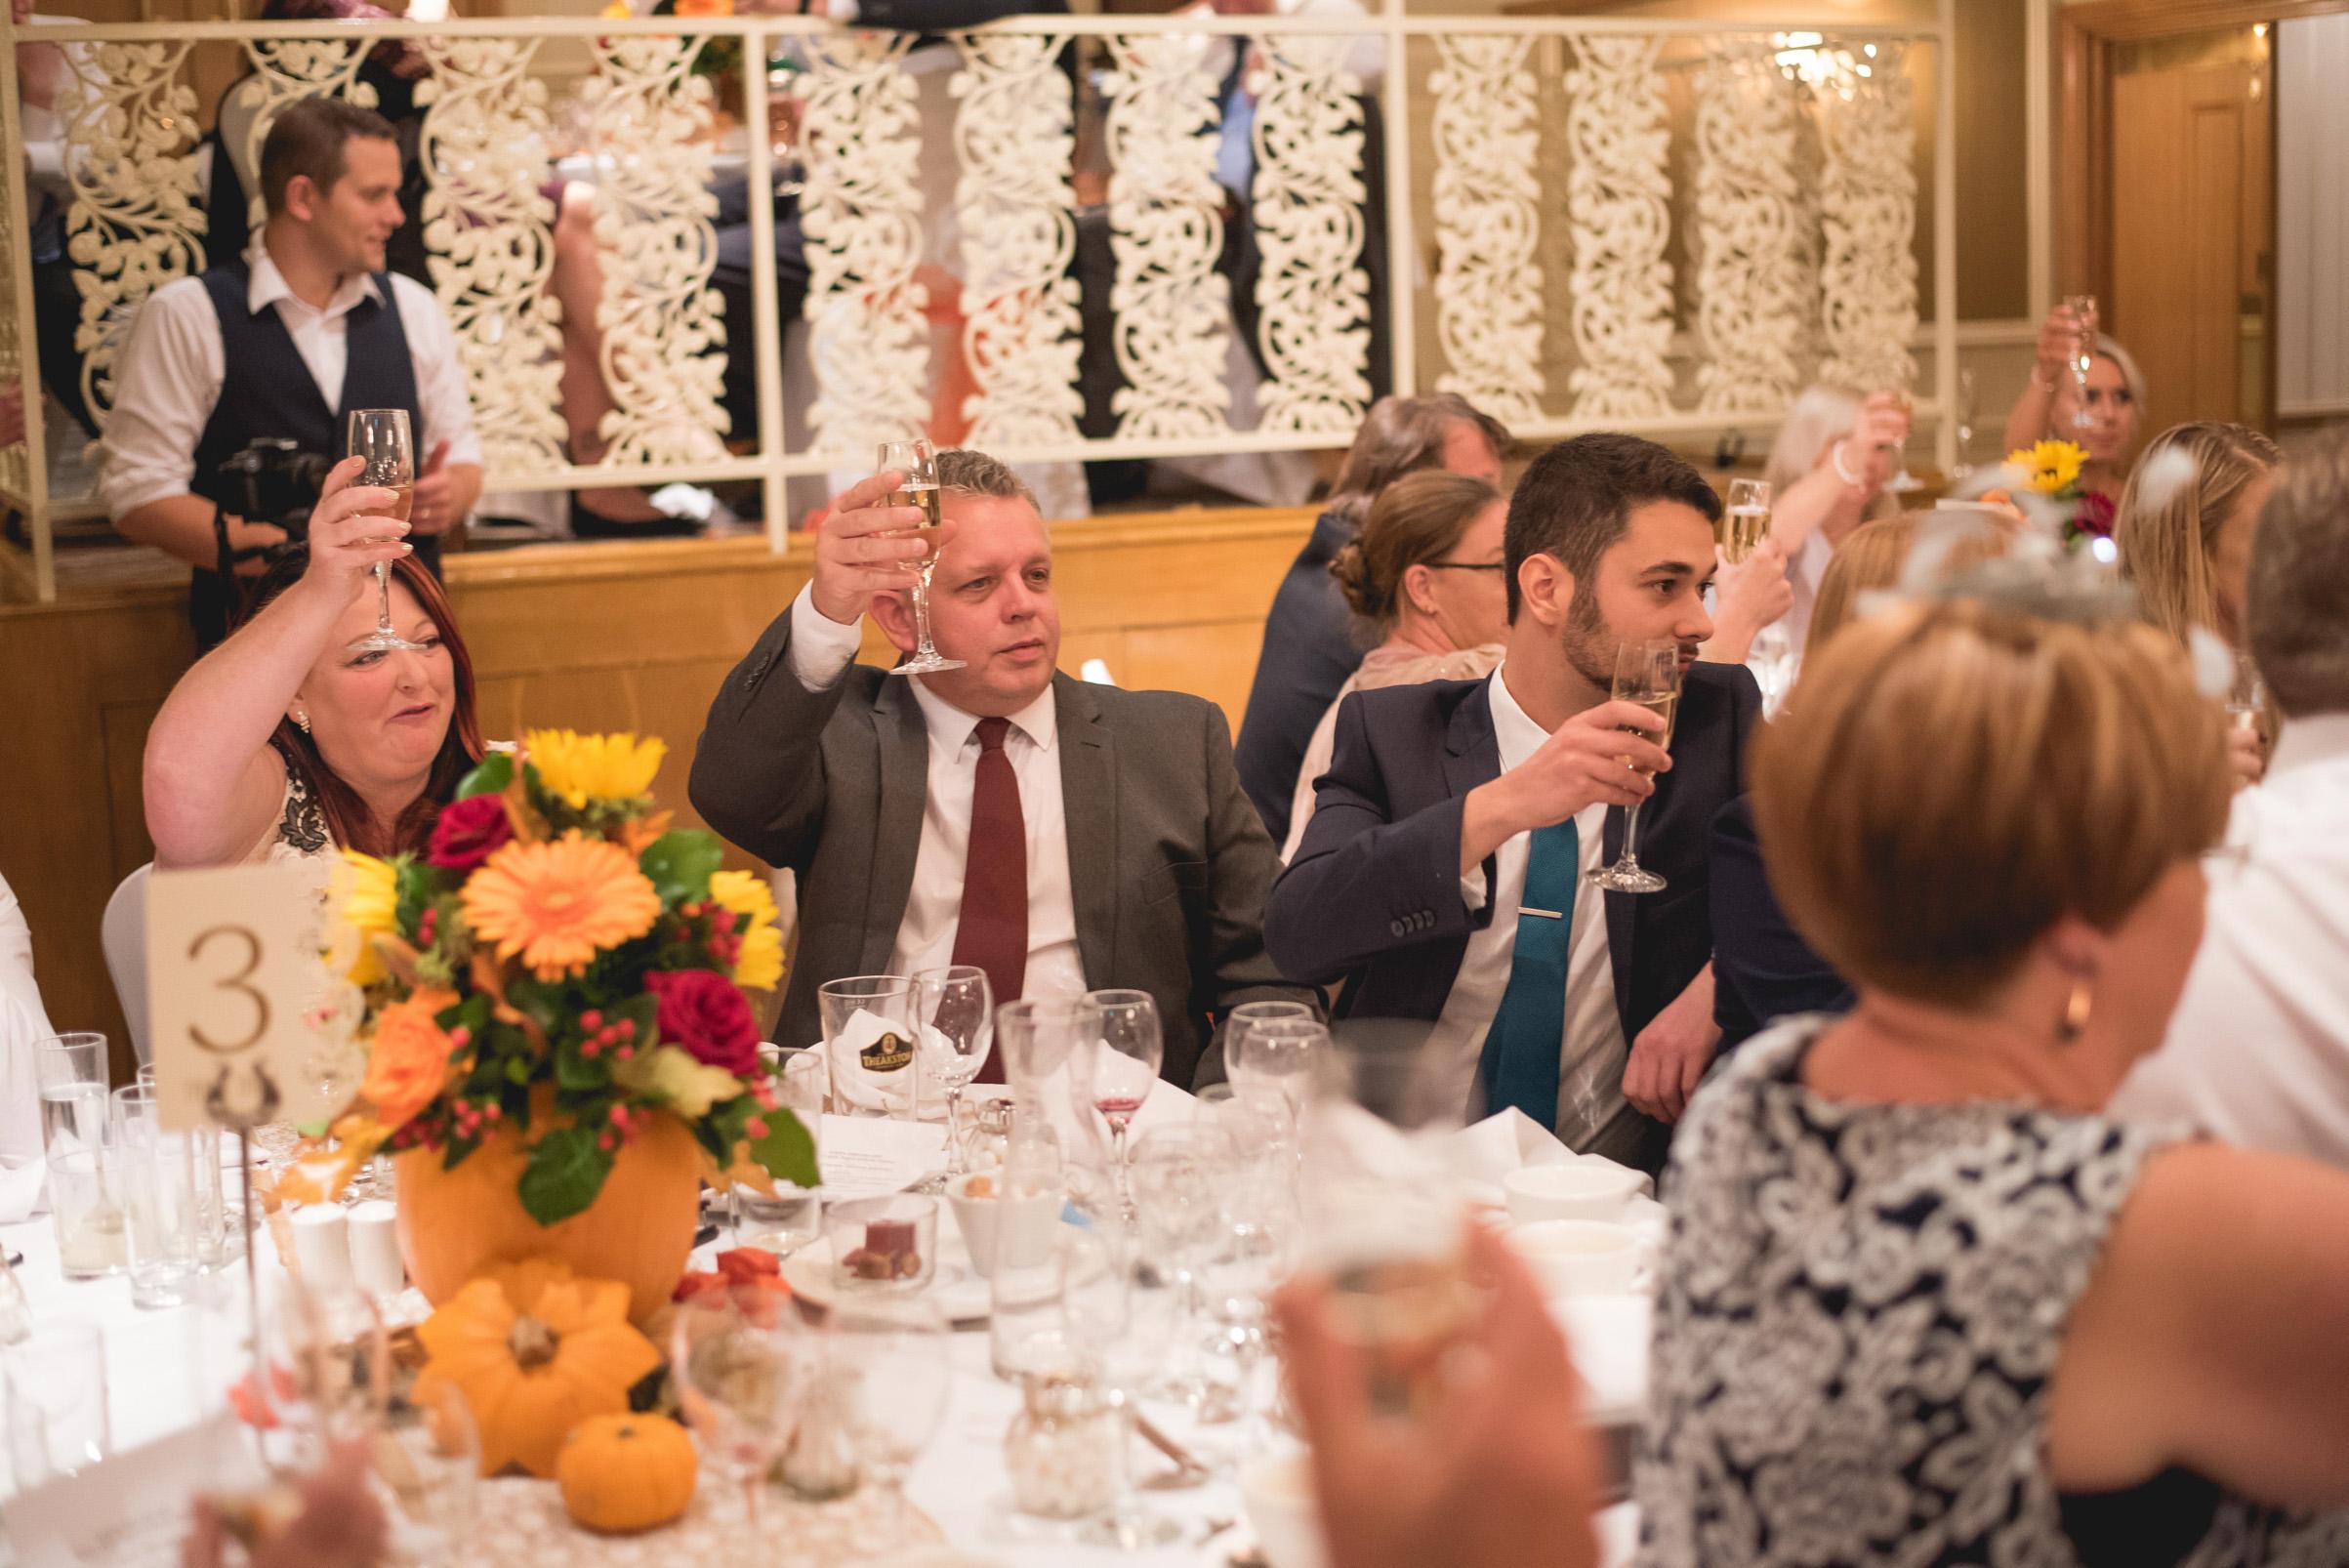 The+Fairlawns+wedding+Aldridge+StLukes+Church-190.jpg